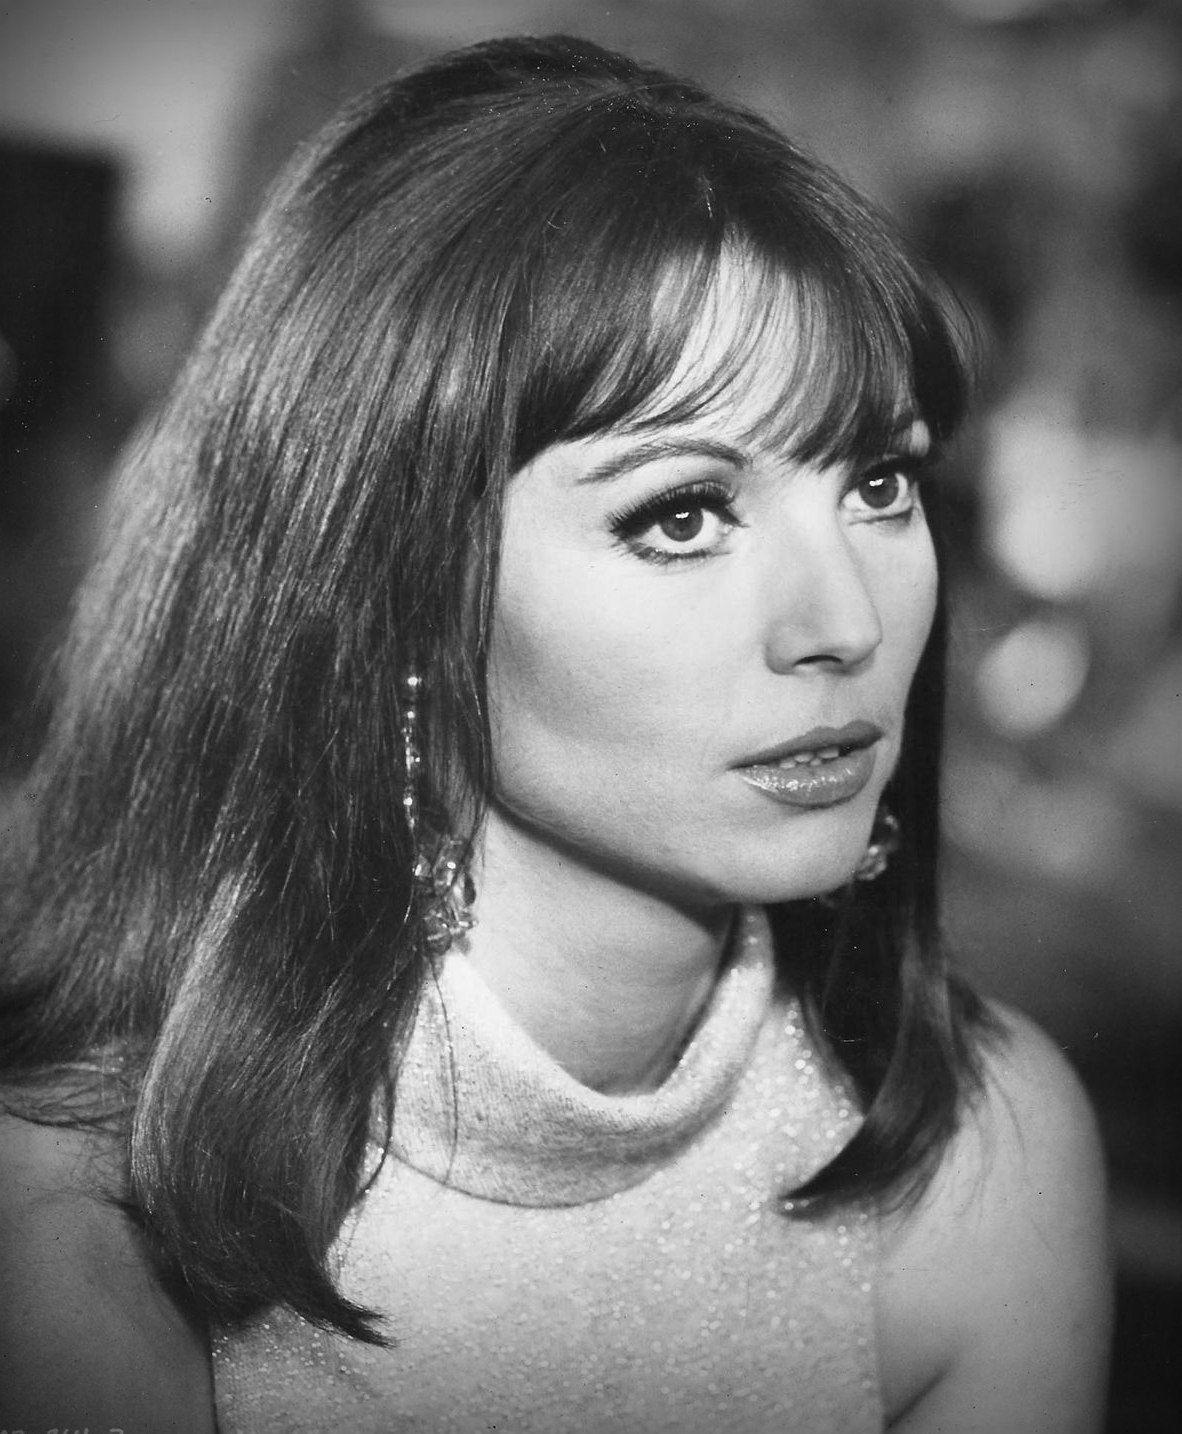 Elsa Martinelli | Elsa pictures, Italian actress, Italian